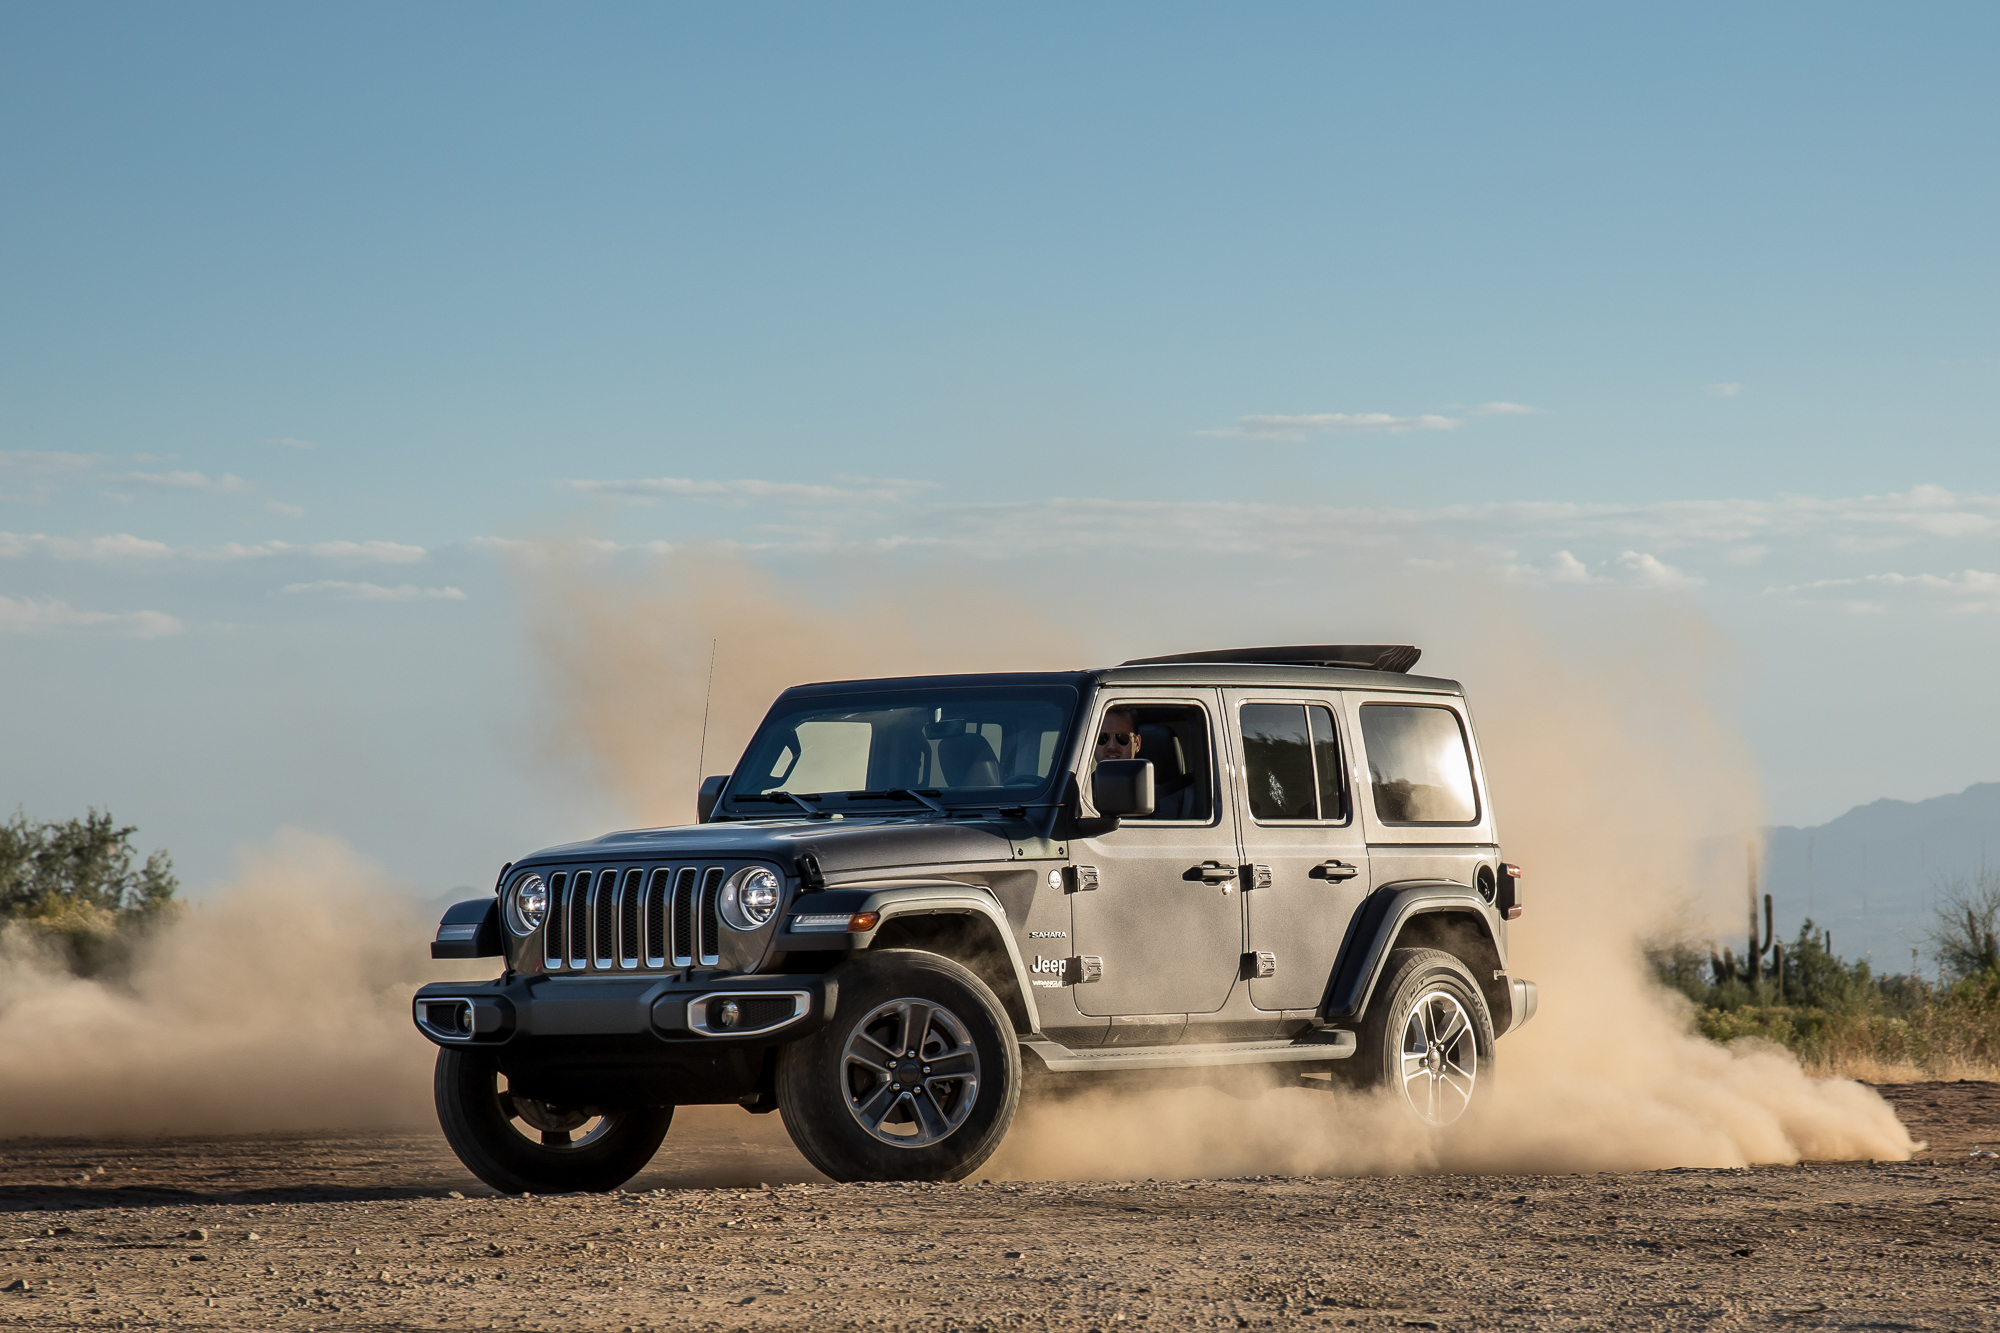 02-jeep-wrangler-2018-angle-dynamic-exterior-front-grey.jpg